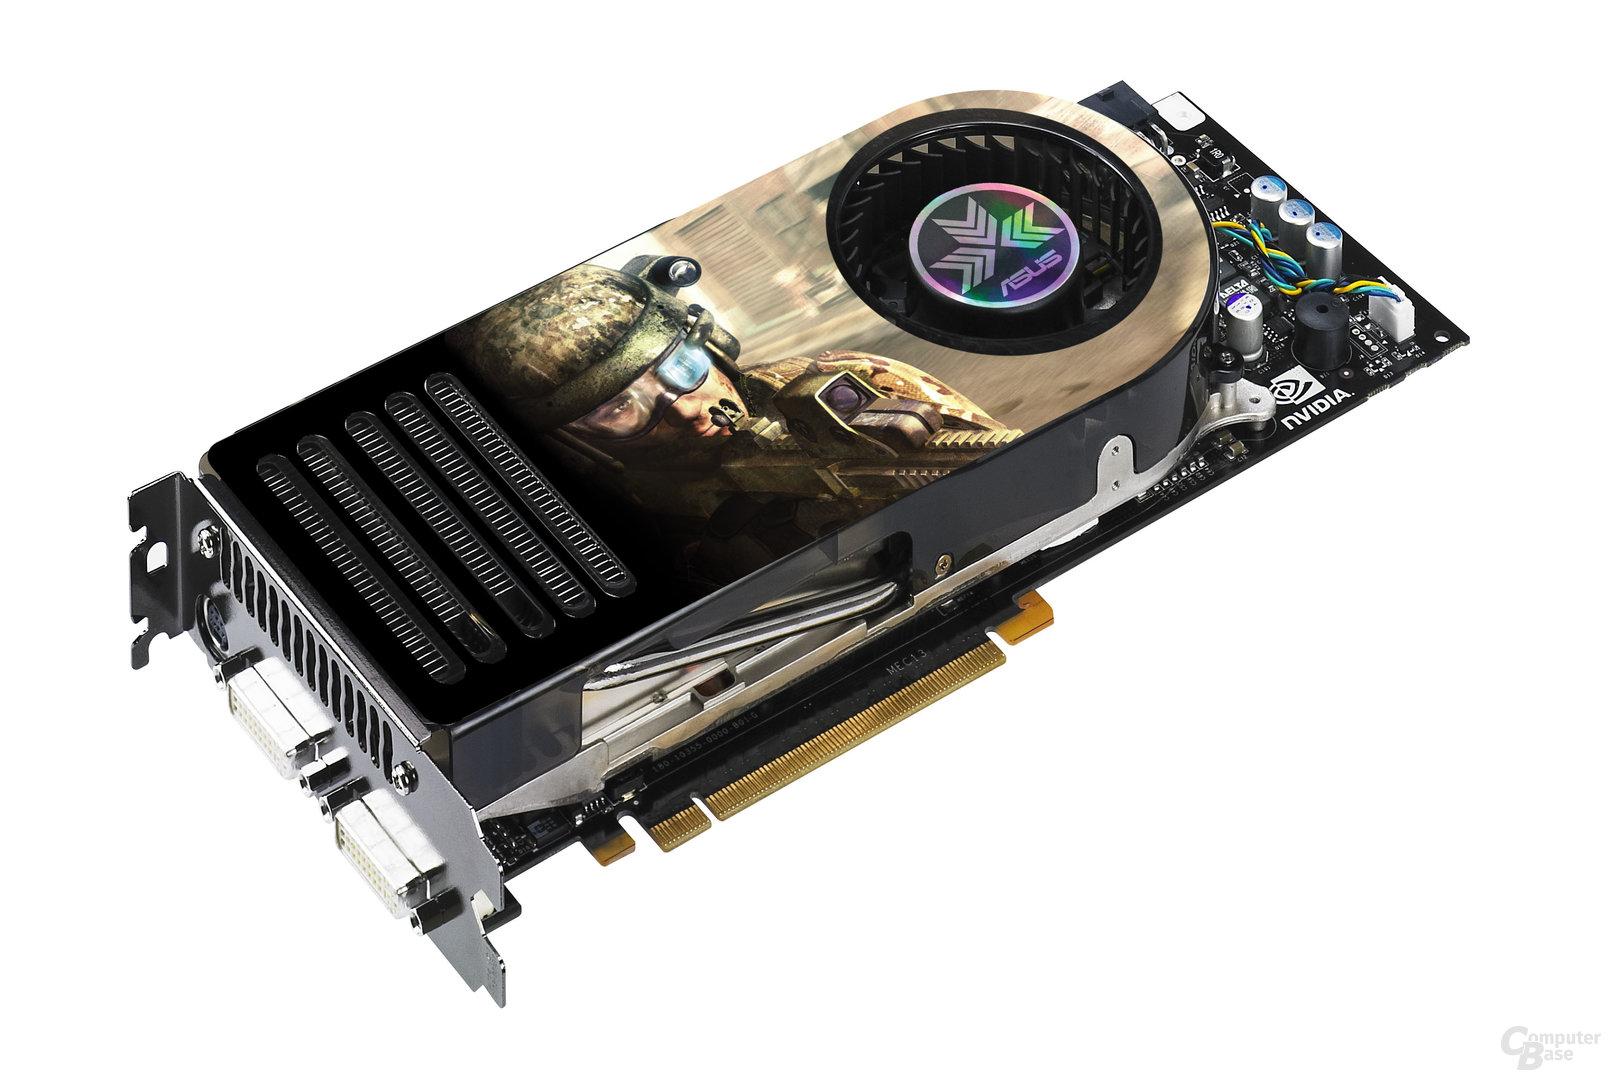 ASUS EN8800GTX/HTDP